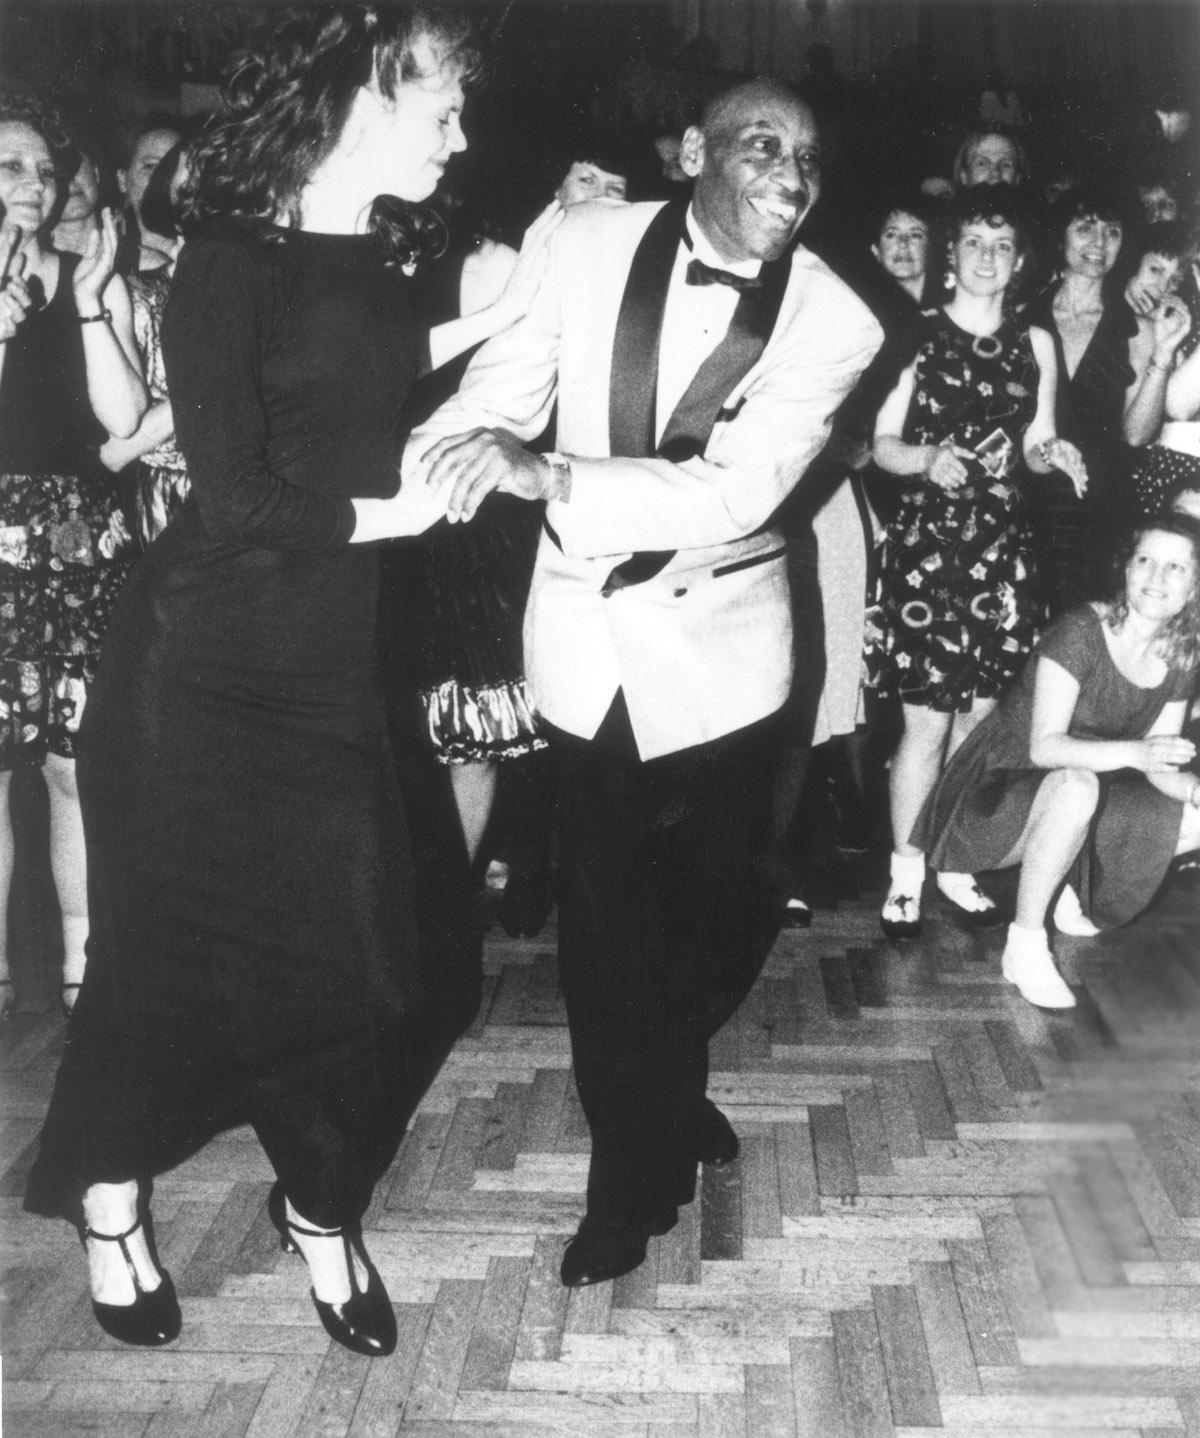 Frankie Manning and Cynthia Millman dancing